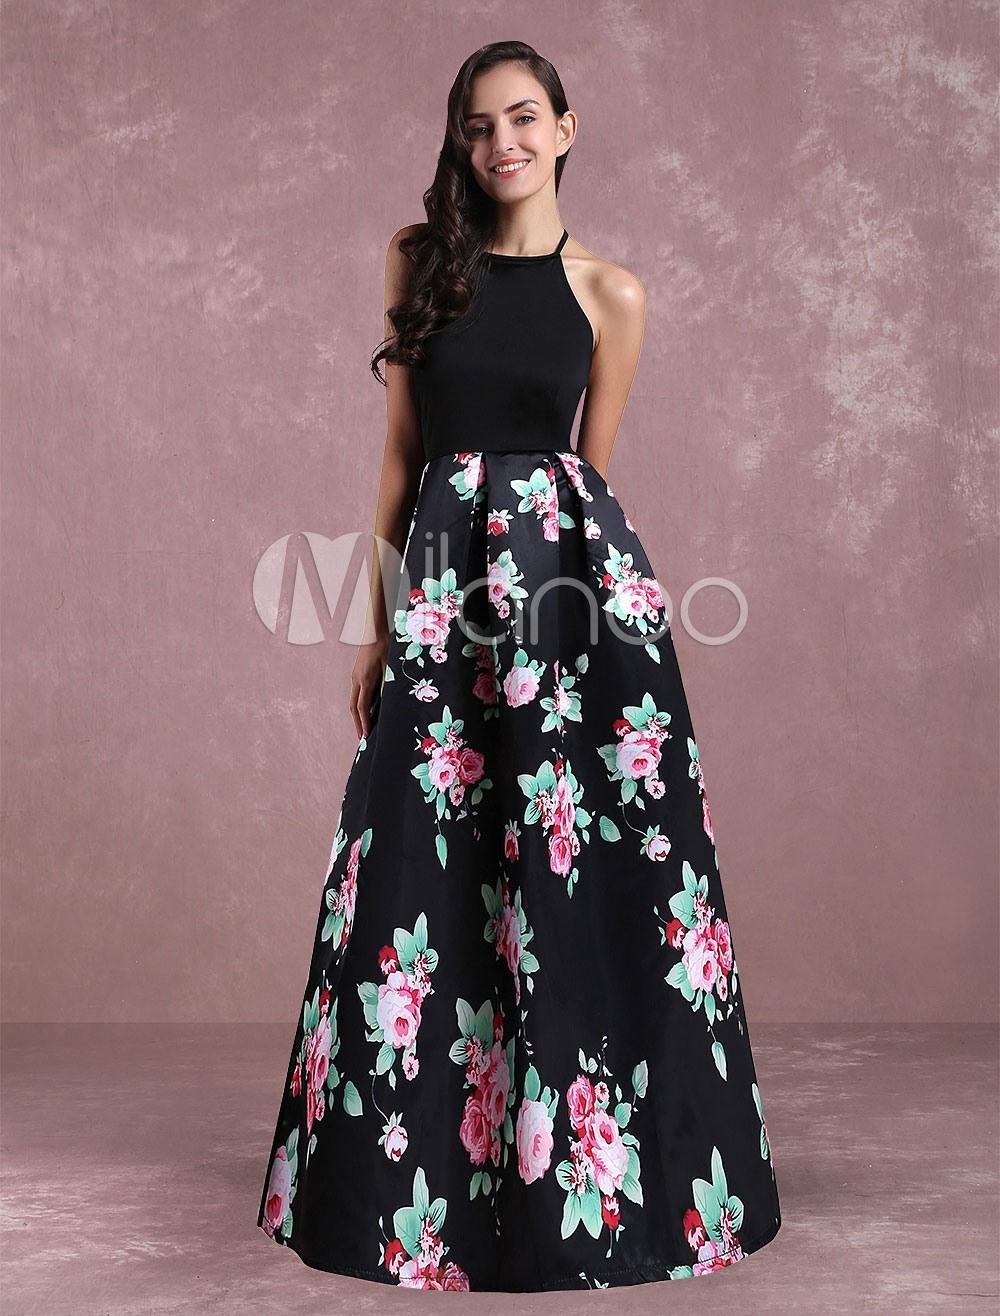 Abend Perfekt Guess Abend Kleid Bester Preis15 Elegant Guess Abend Kleid Boutique